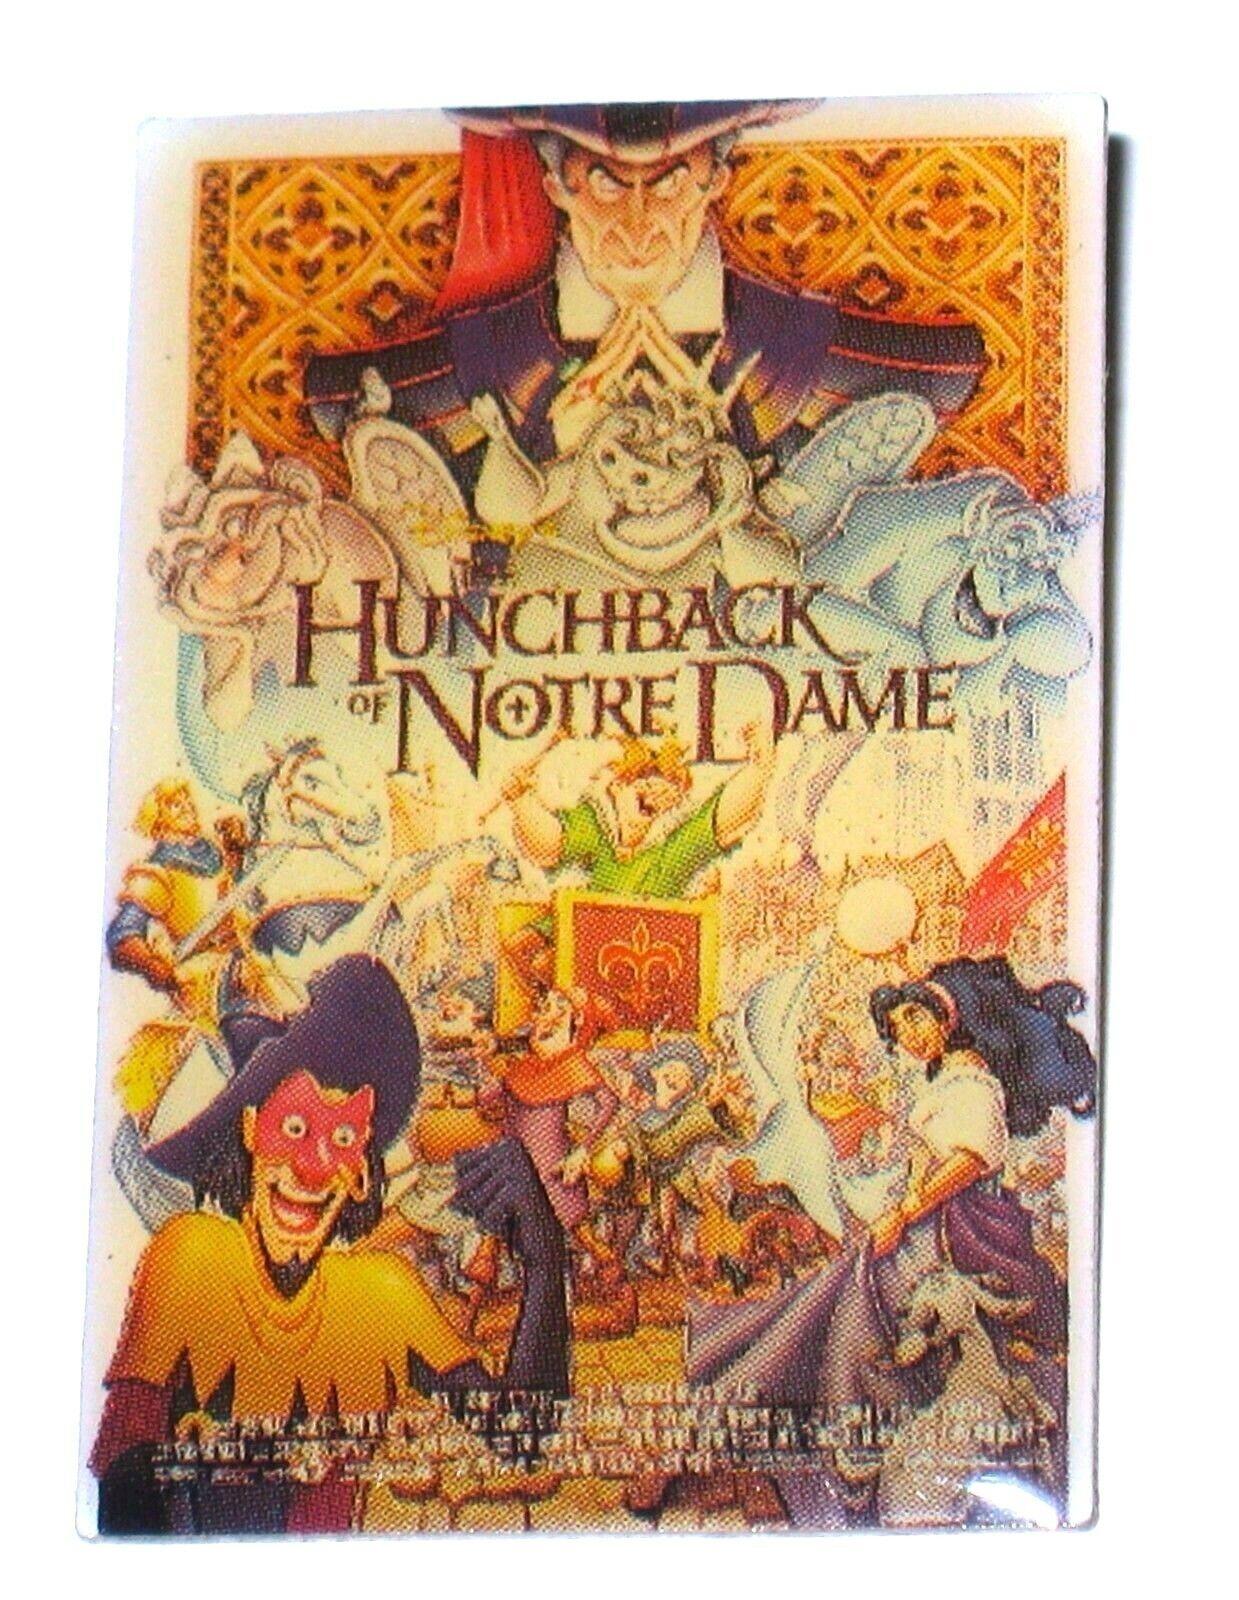 LE Disney PIN Original Movie Poster Hunchback Notre Dame Cat